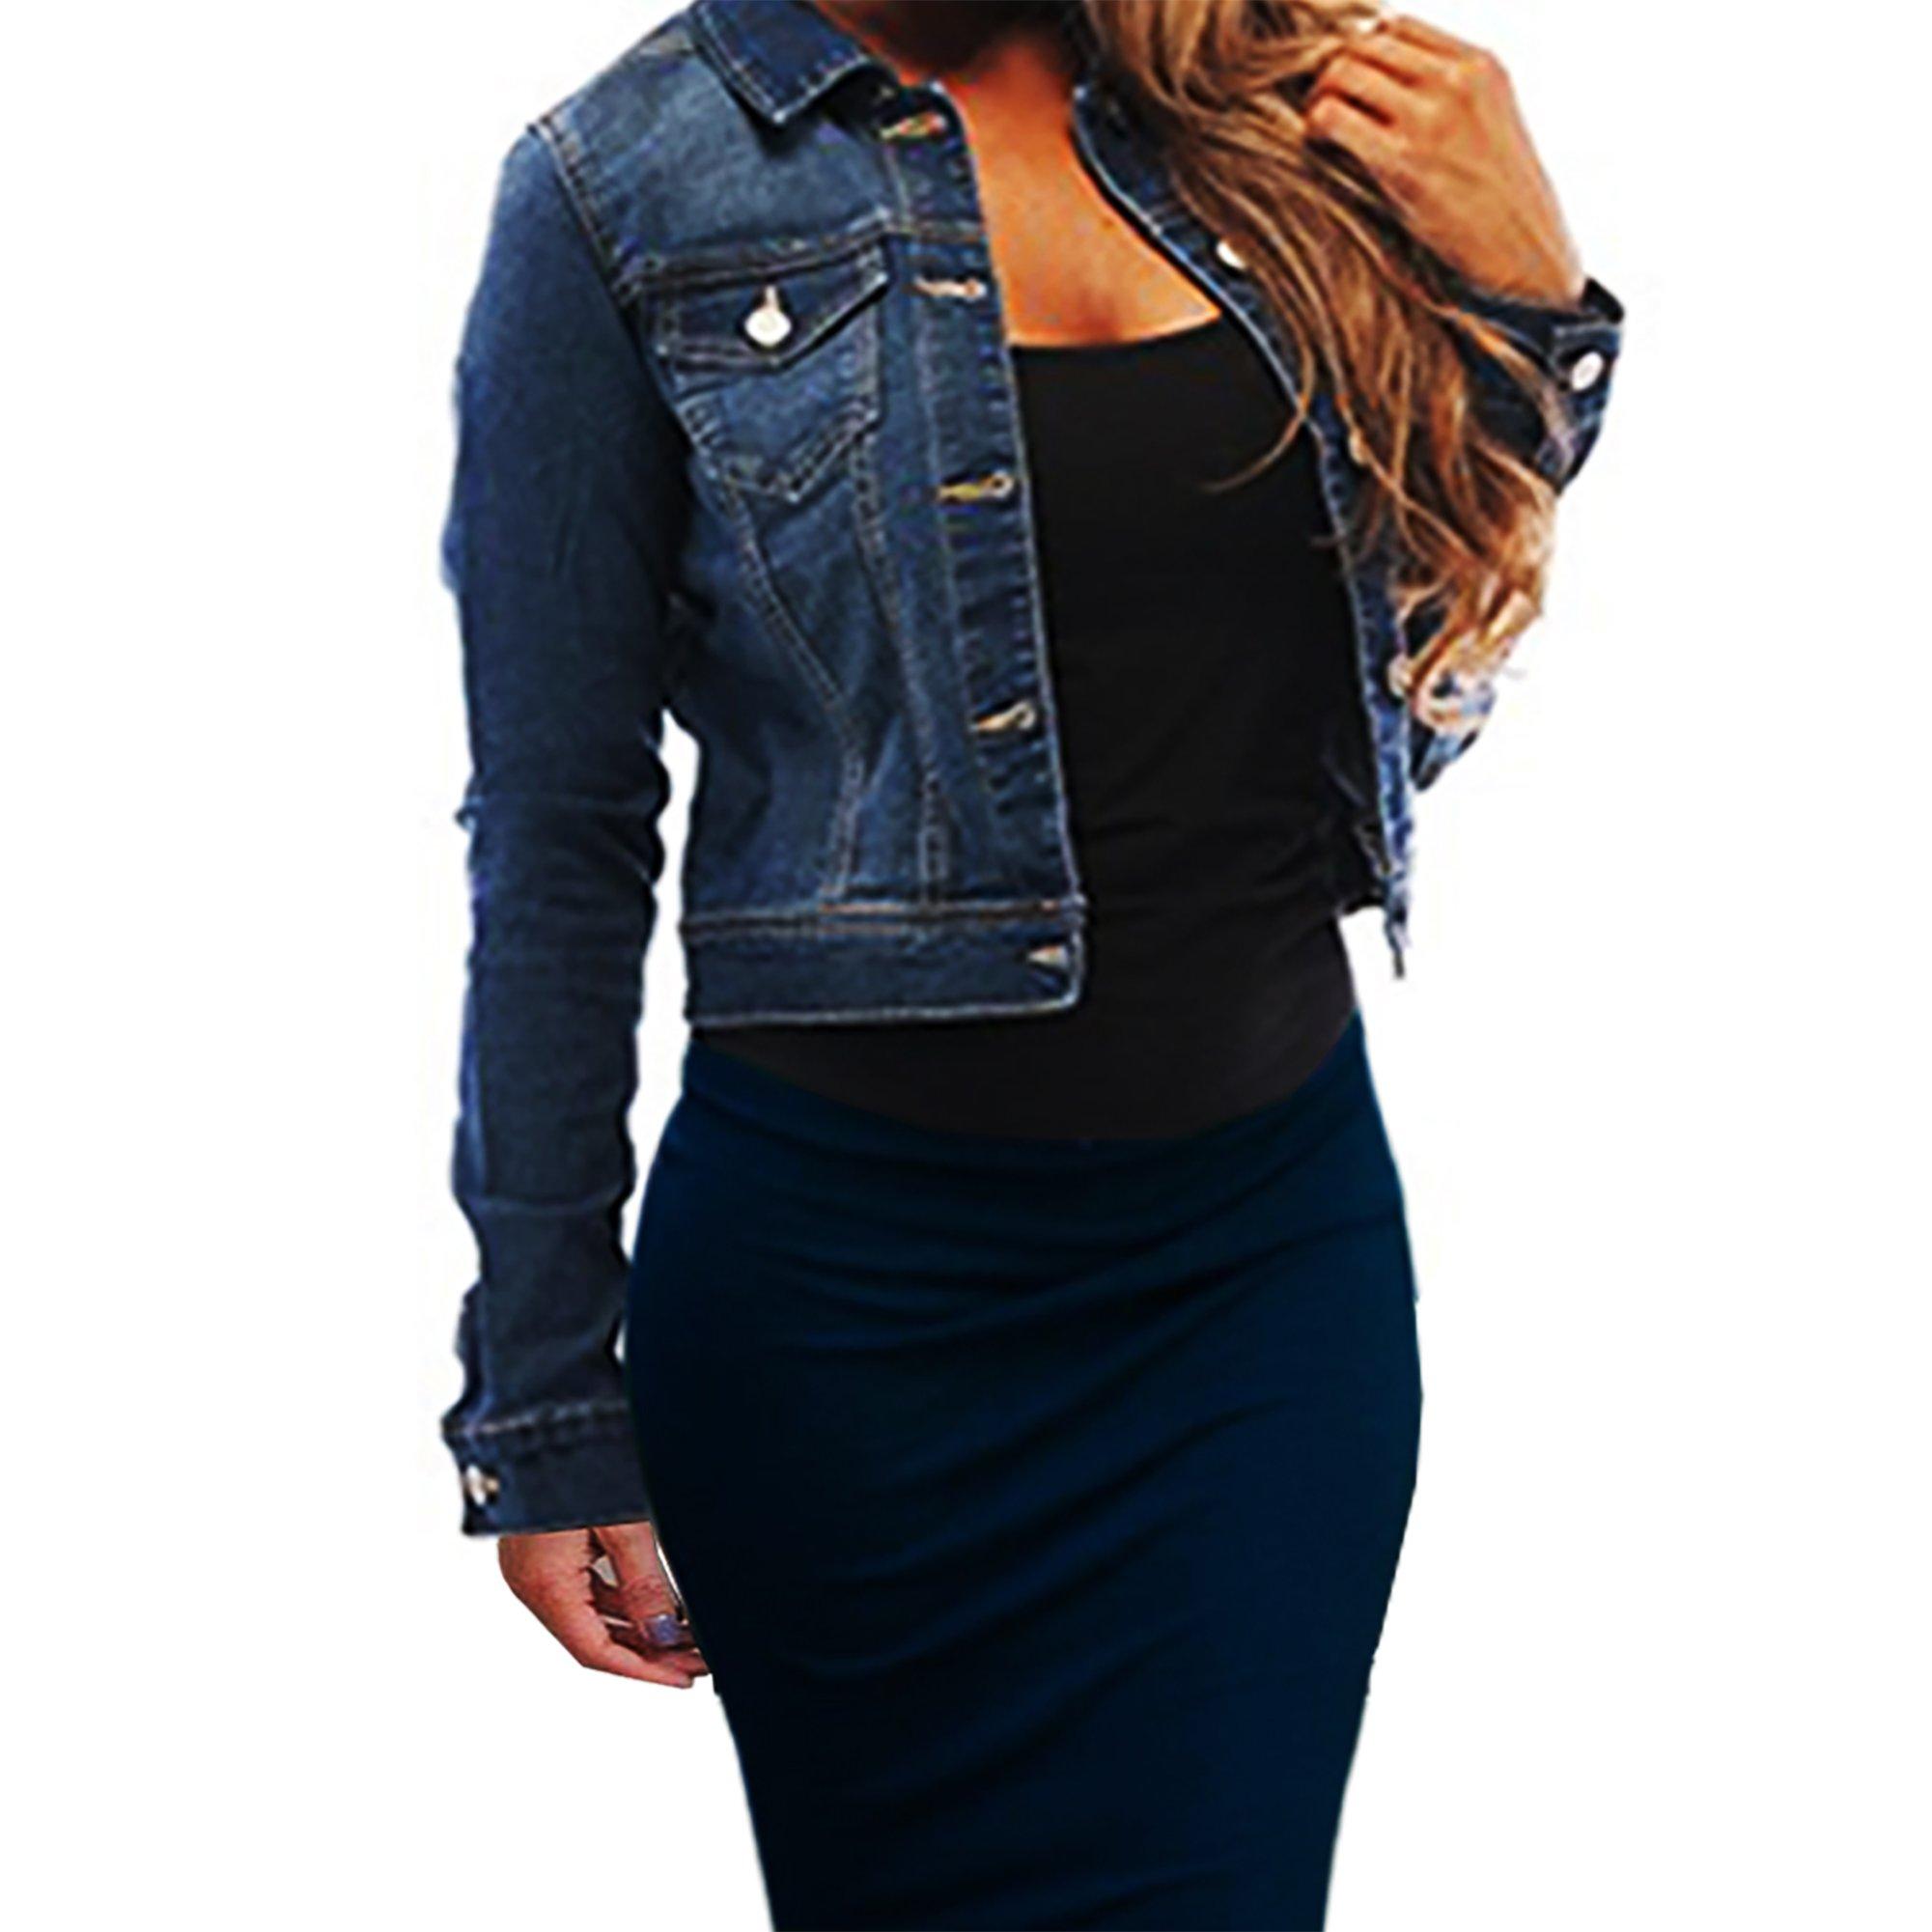 SKYLINEWEARS Womens Full Sleeve Coat Casual Jean Soft Denim Jacket Small